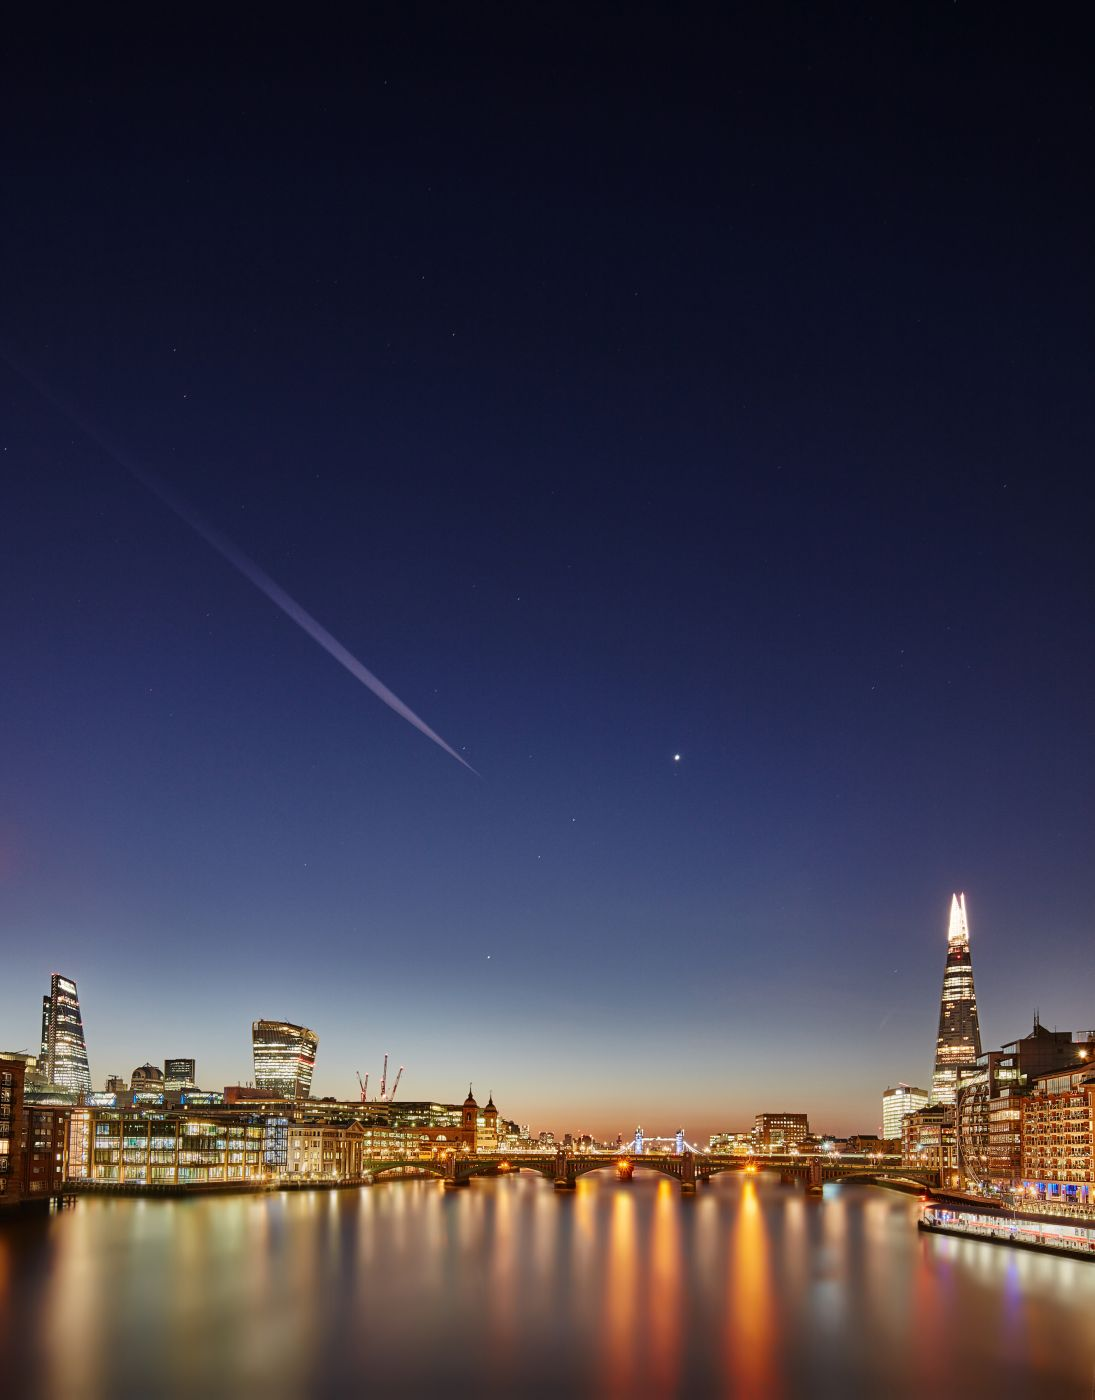 London, river side, by the millenium bridge, United Kingdom